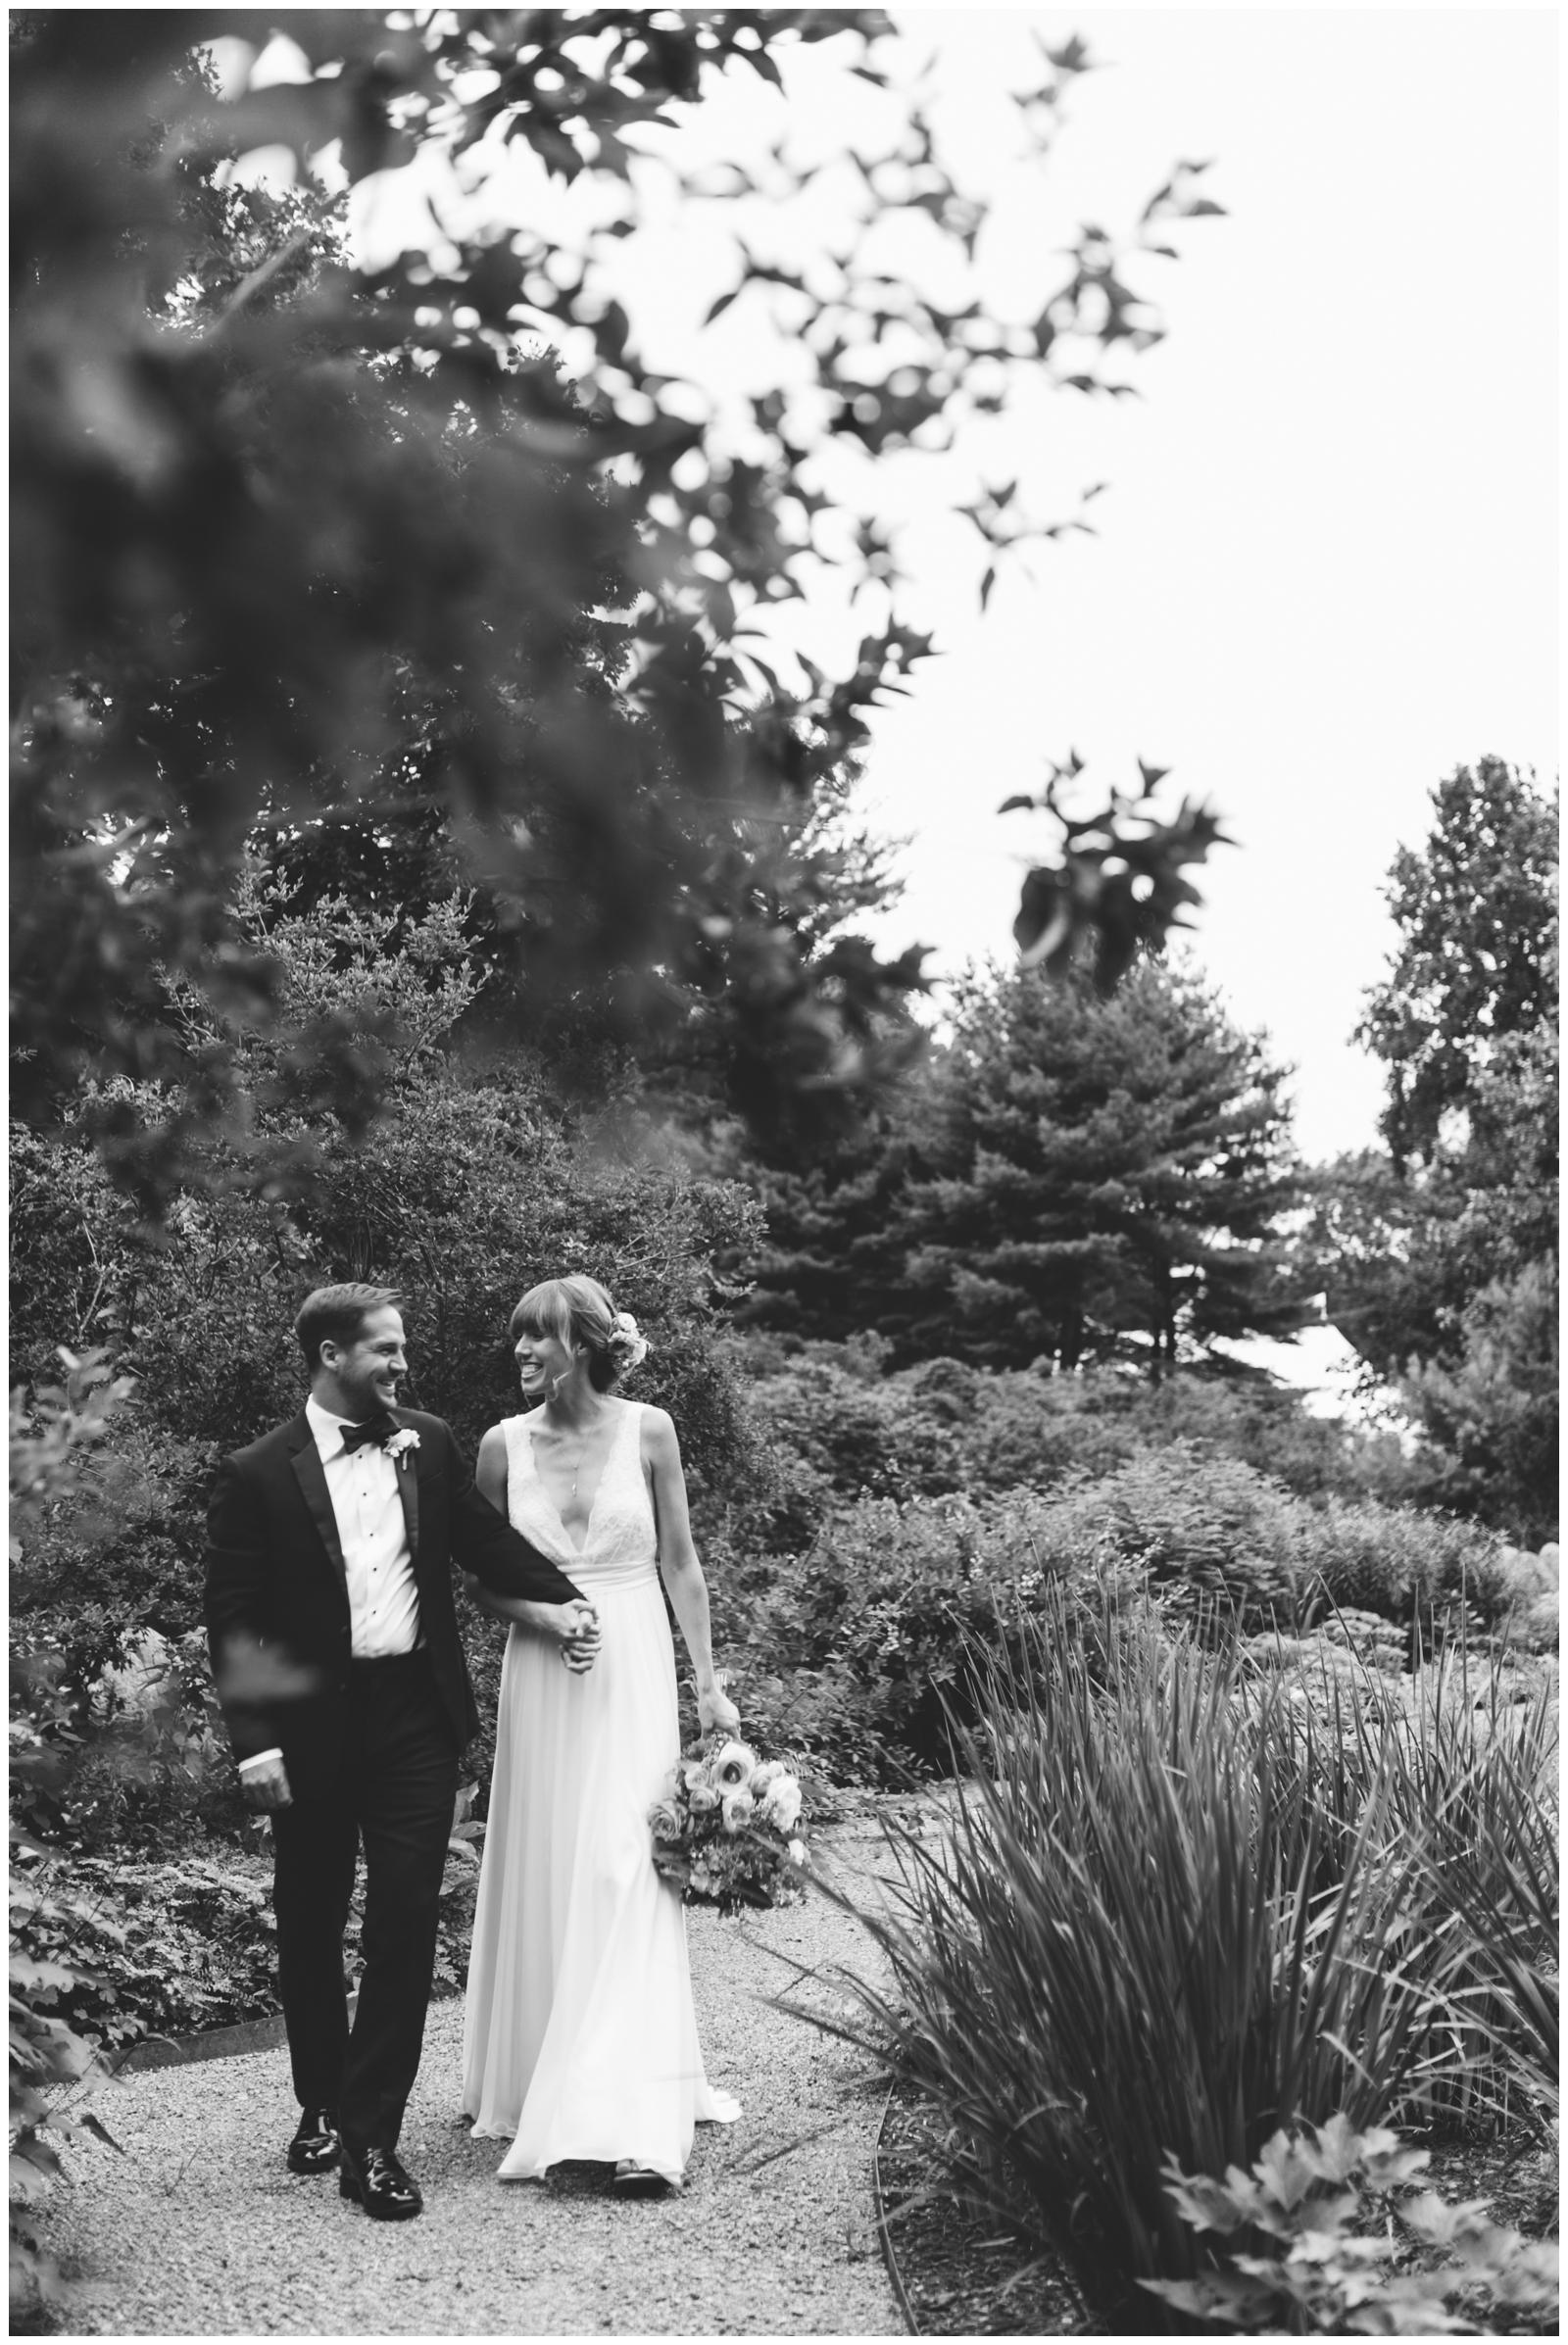 Moraine-Farm-wedding-Bailey-Q-Photo-Massachusetts-wedding-photpgrapher-029.jpg